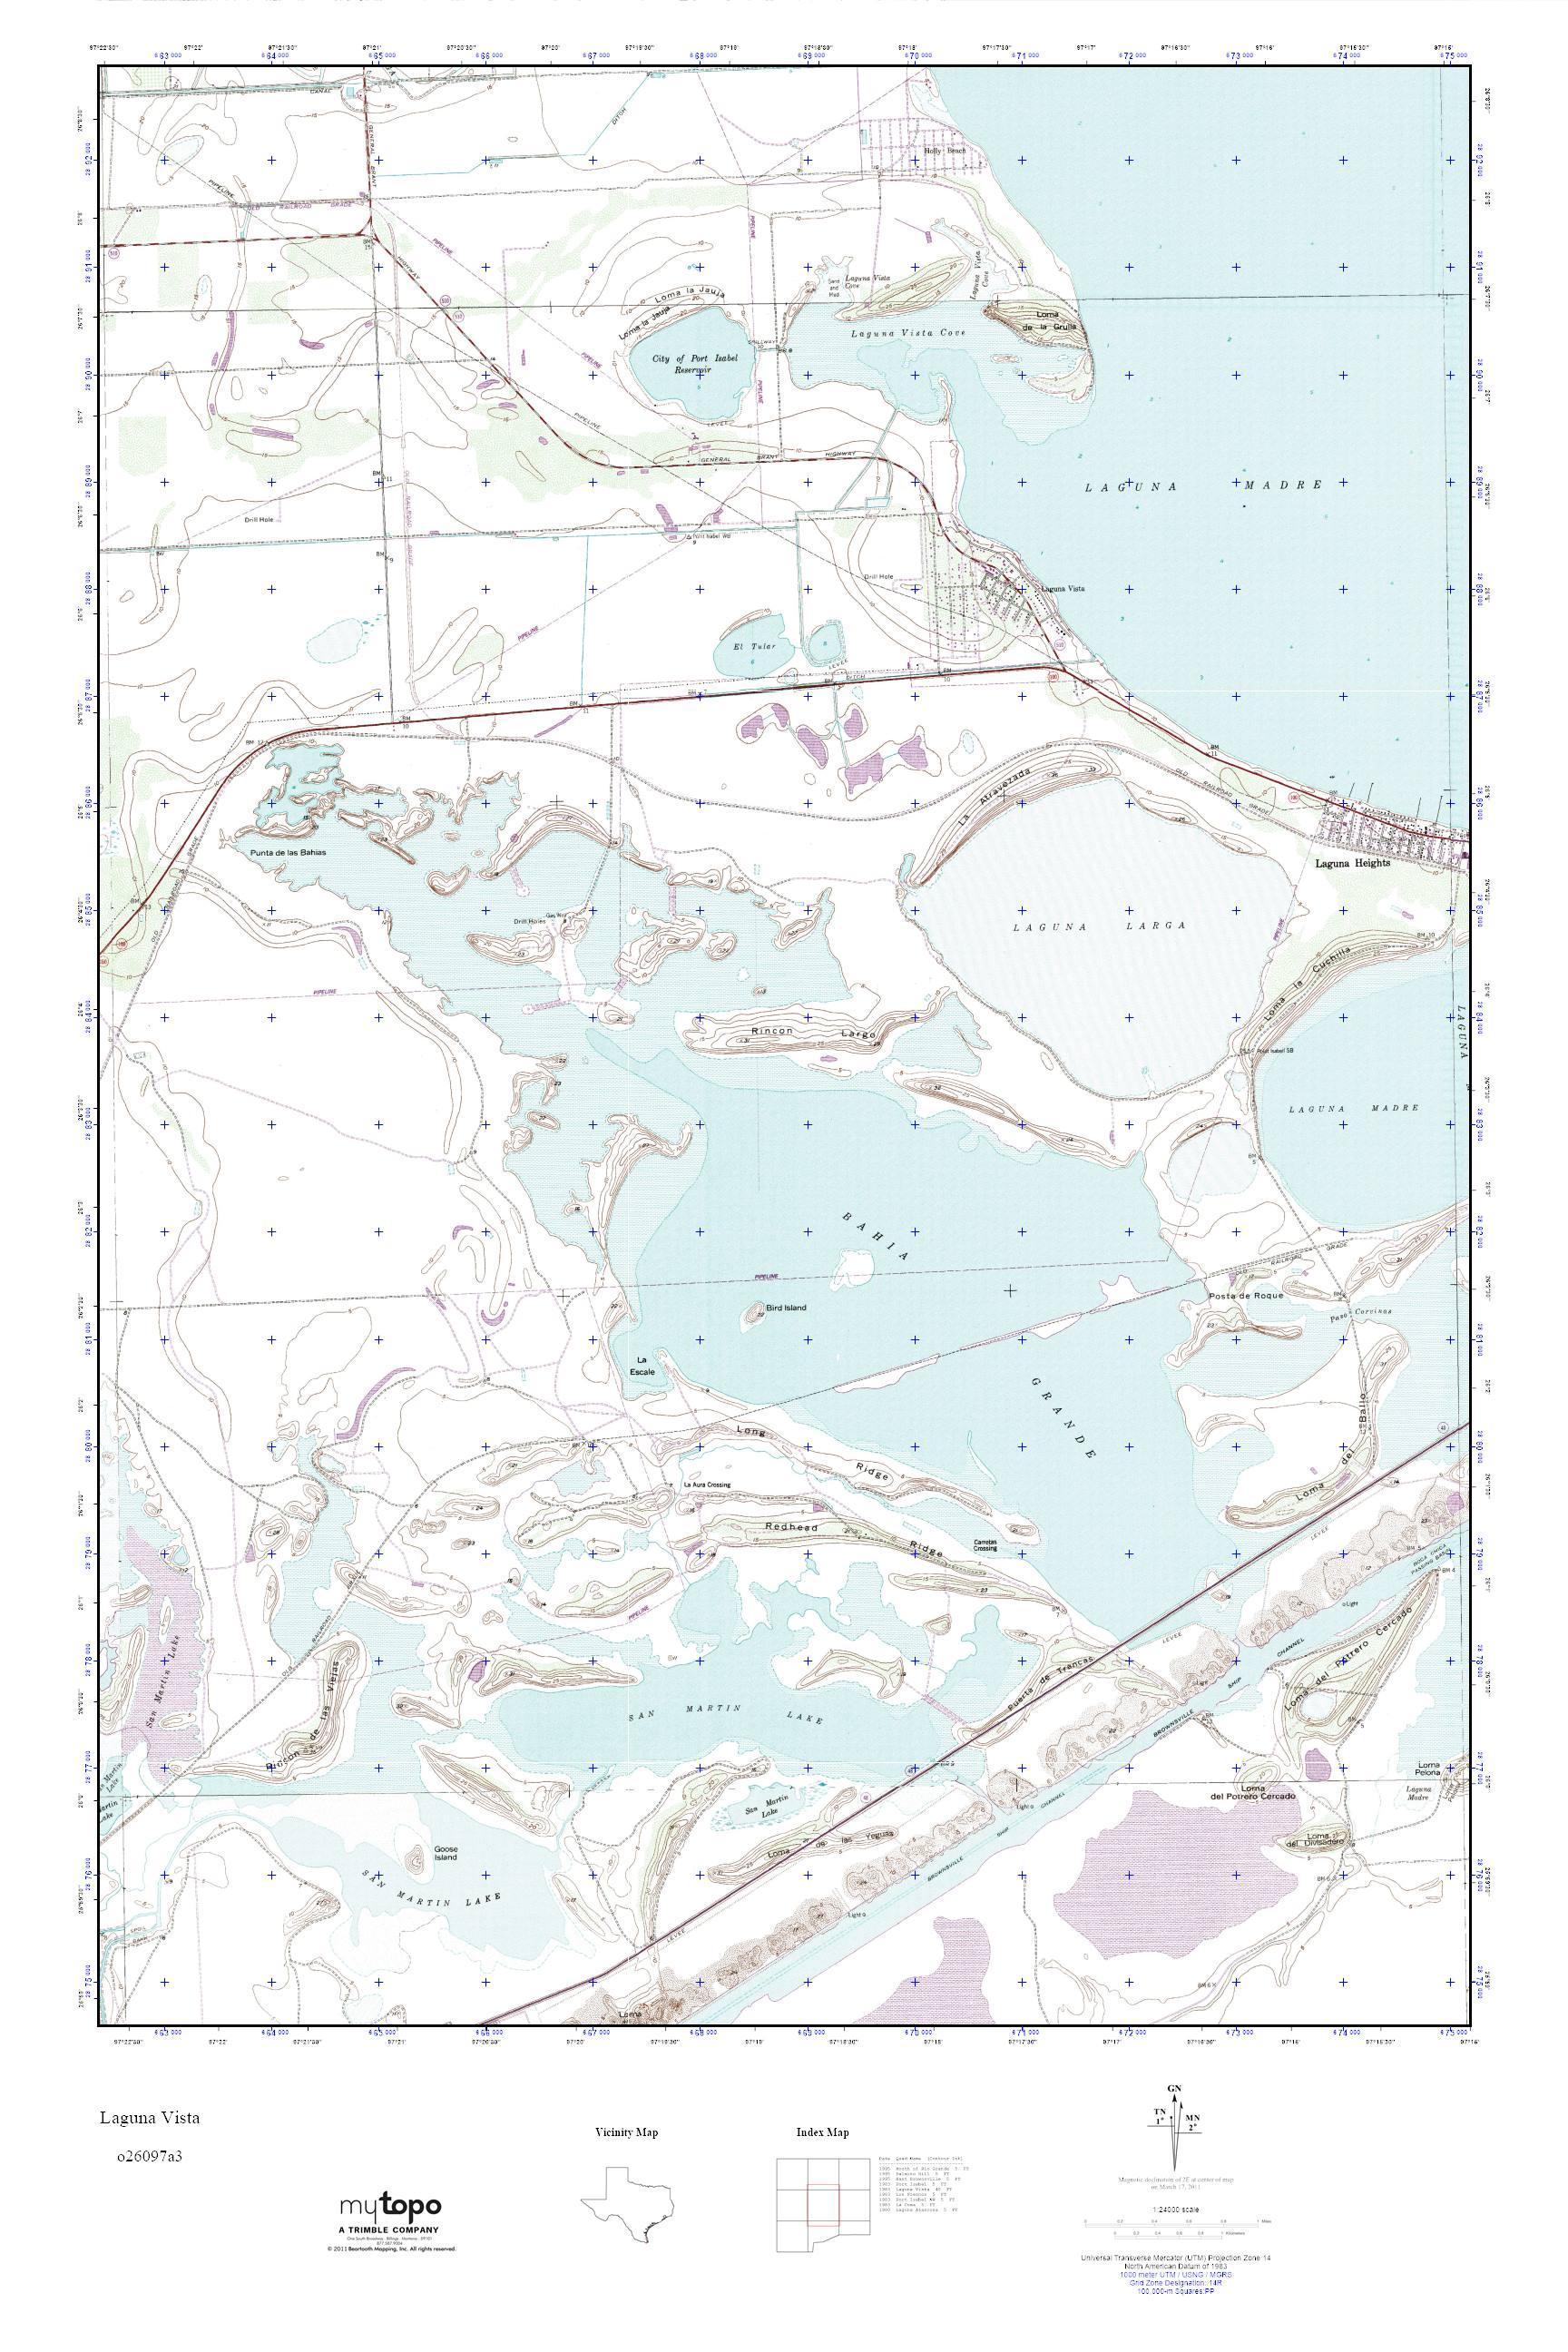 MyTopo Laguna Vista, Texas USGS Quad Topo Map on map of la vernia tx, map of ingleside tx, map of pleasanton tx, map of st hedwig tx, map of george west tx, map of lufkin tx, map of la feria tx, map of raymondville tx, map of gun barrel city tx, map of humble tx, map of camp wood tx, map of uvalde tx, map of rio grande city tx, map of leakey tx, map of groves tx, map of katy tx, map of rocksprings tx, map of henderson tx, map of harlingen tx, map of lindale tx,